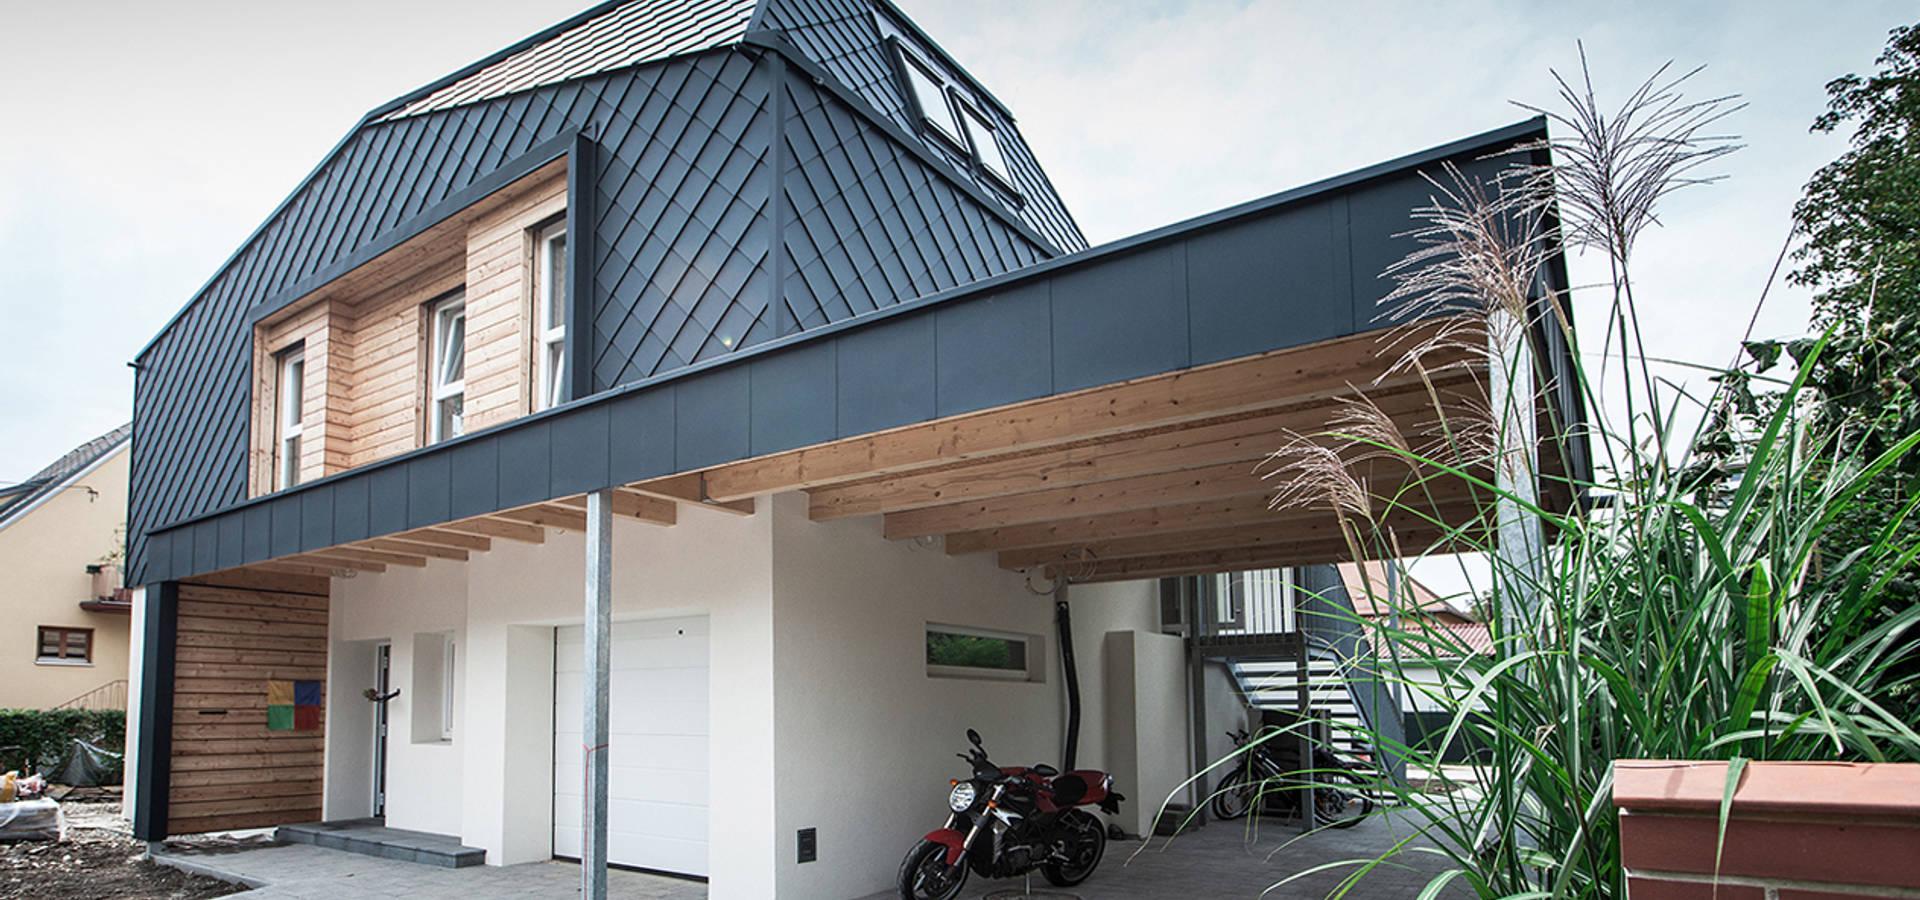 Florian Schober Architektur ZT